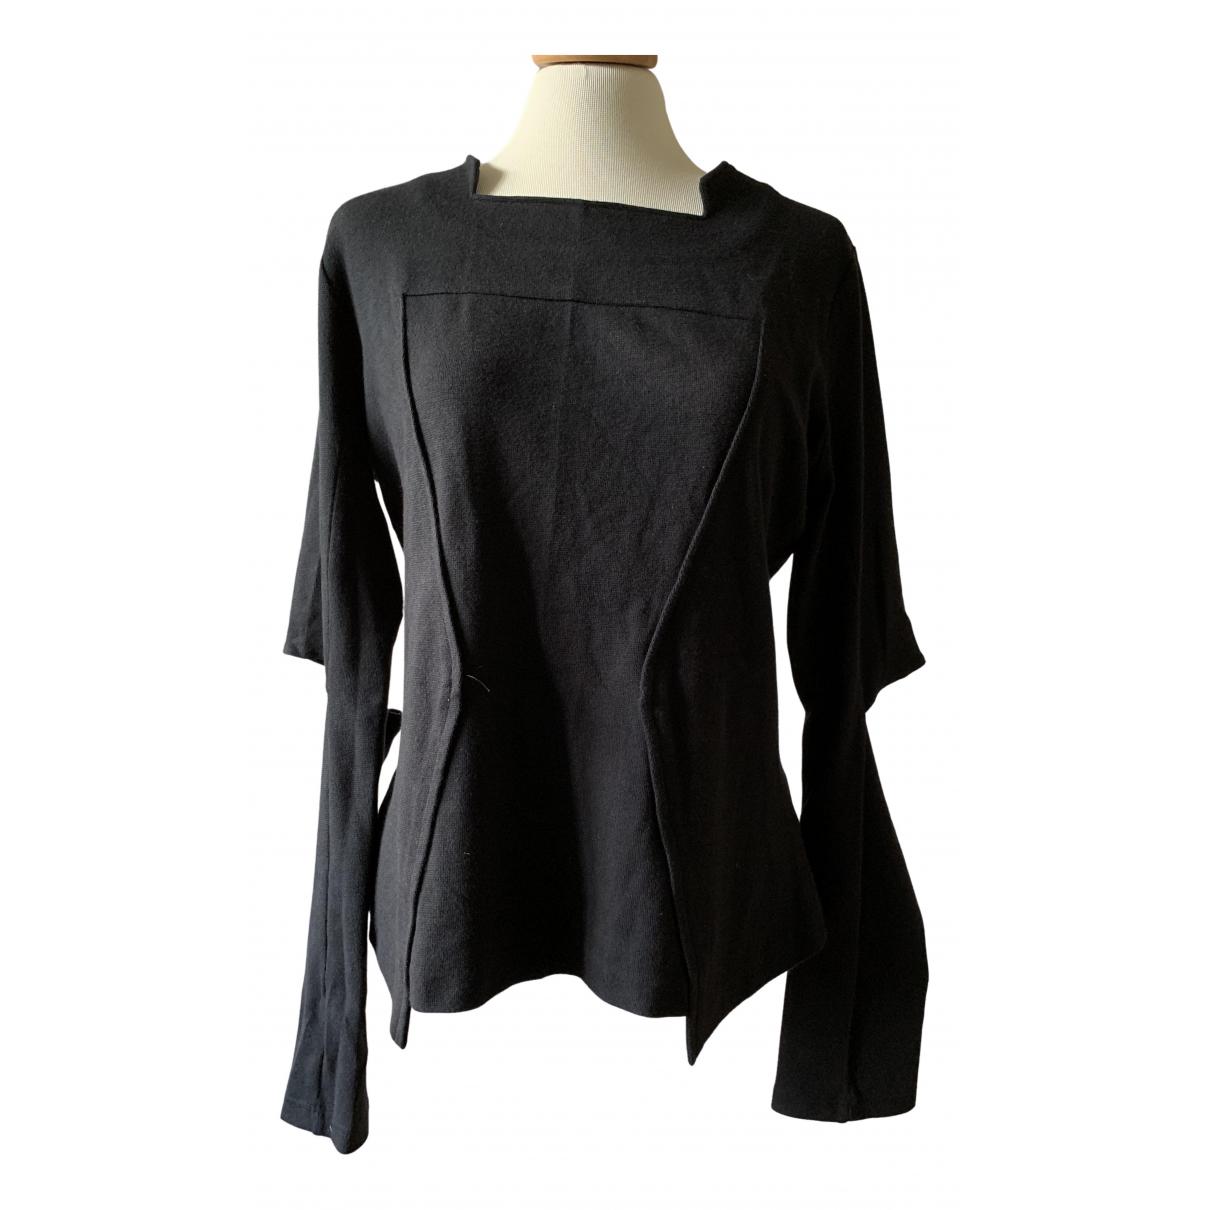 Maria Luisa - Top   pour femme en coton - noir